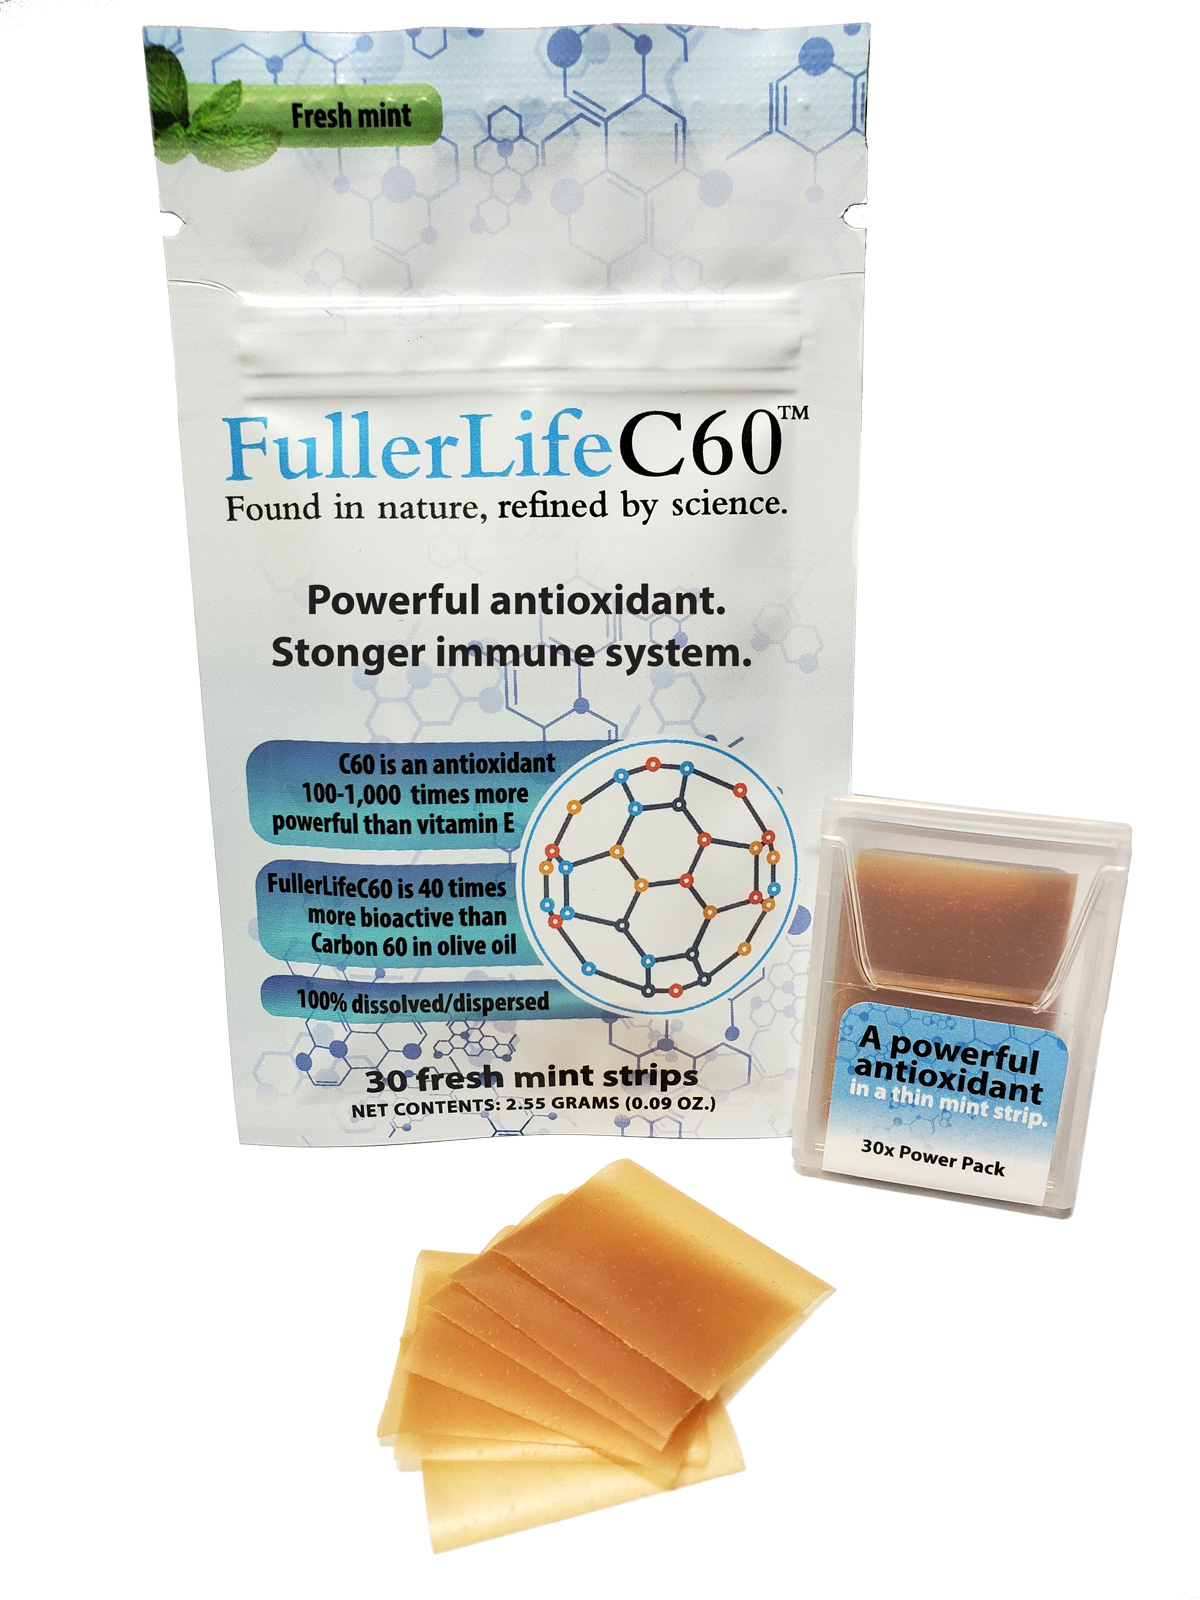 Carbon 60 (C60) Antioxidant from FullerLifeC60 ...